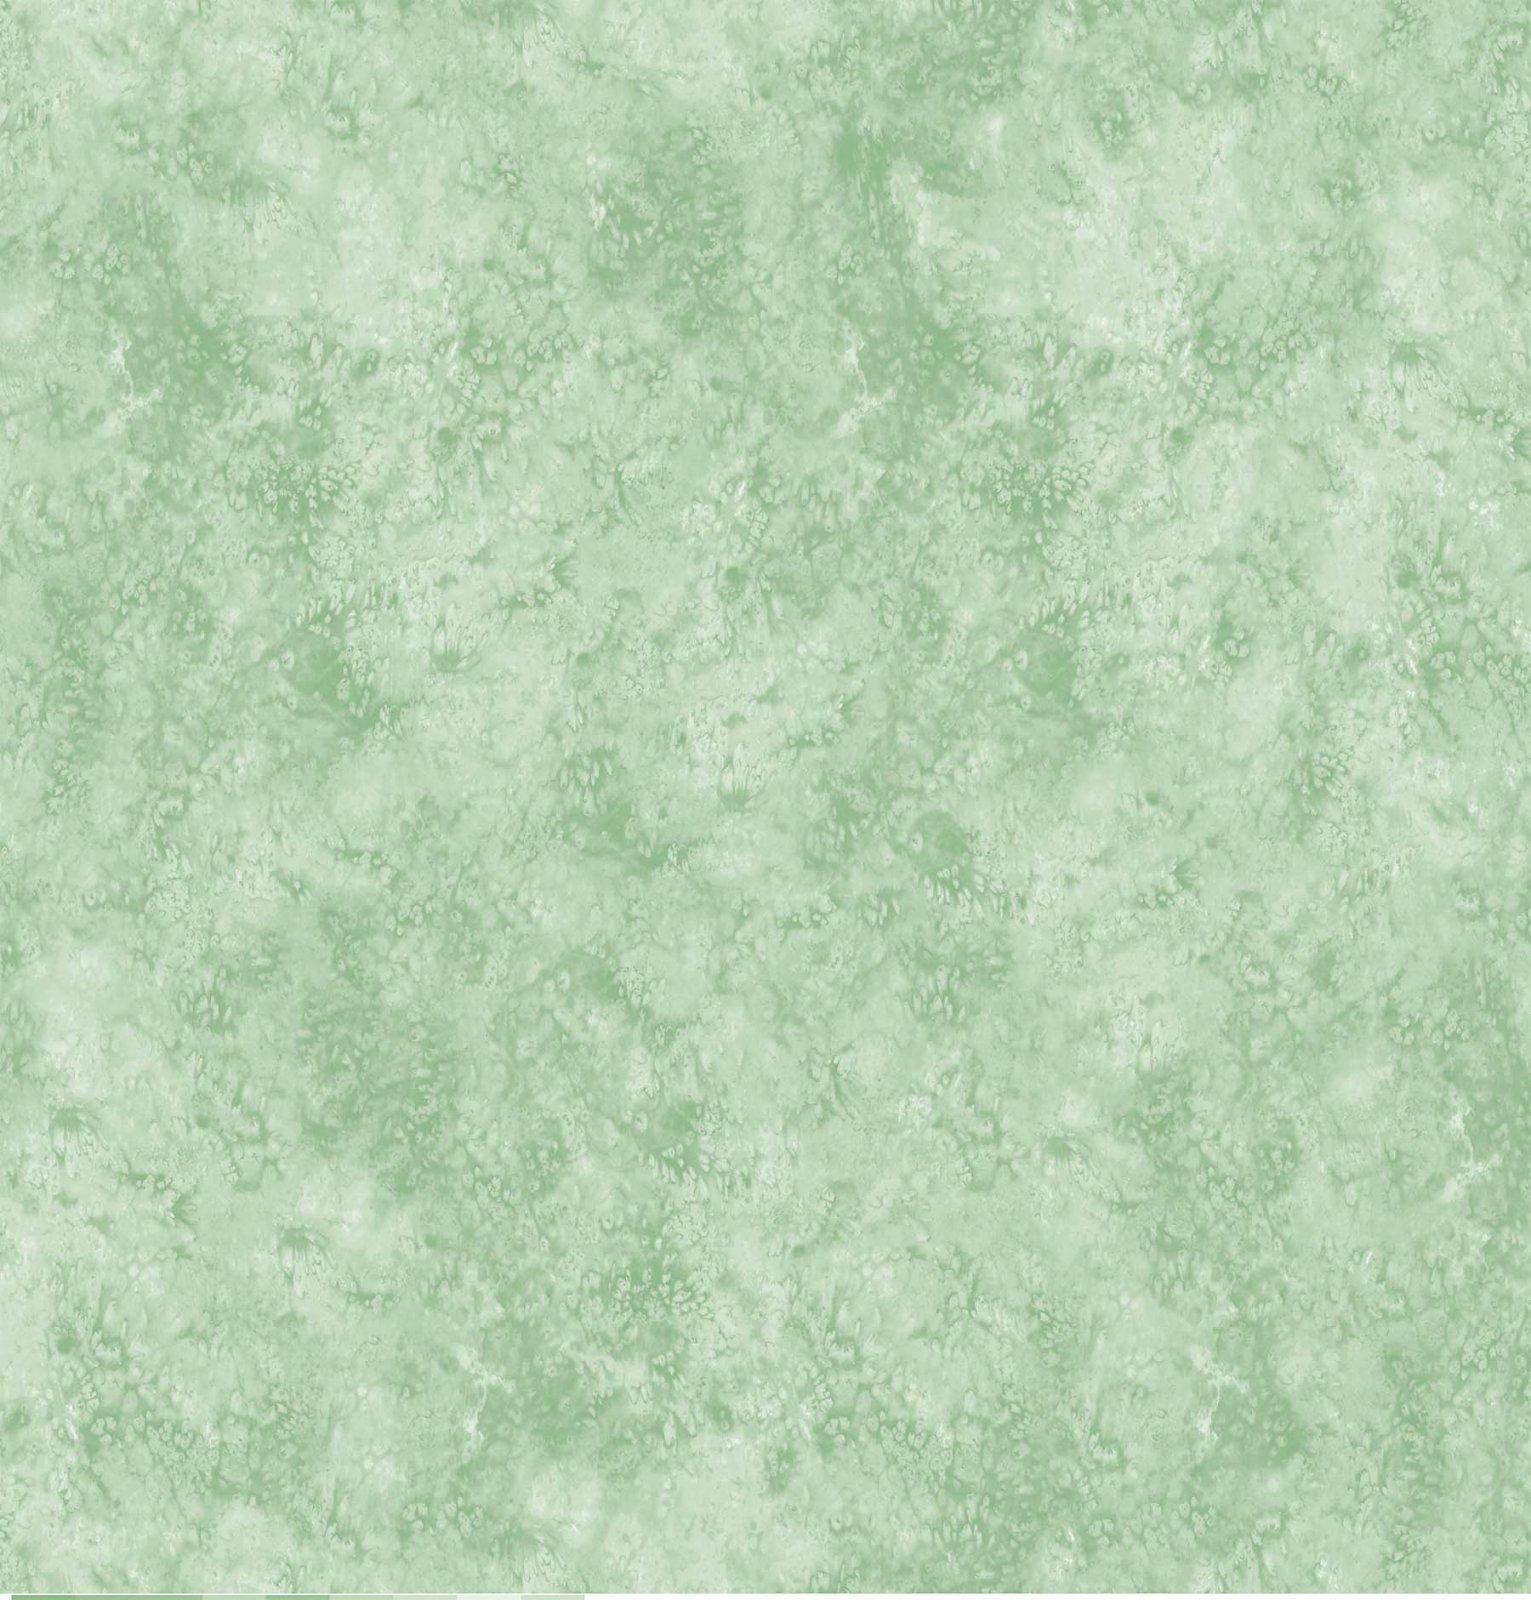 Coastal Christmas Green Salt Texture 23430-72